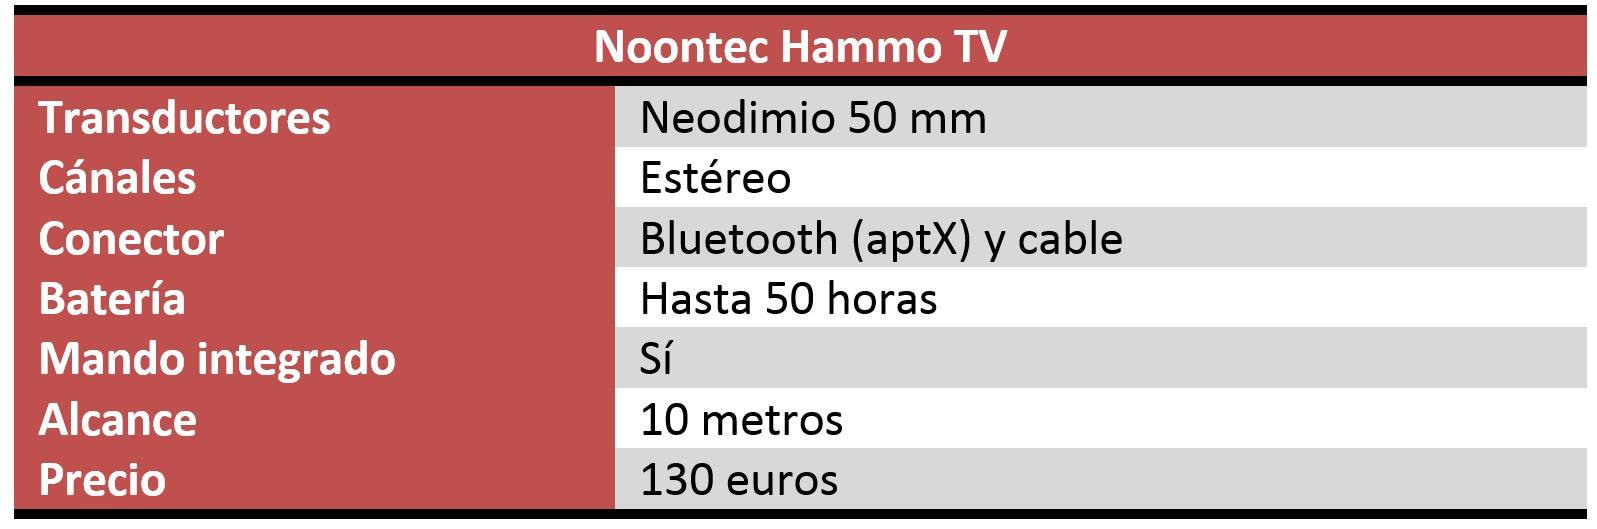 Noontec Hammo TV Review